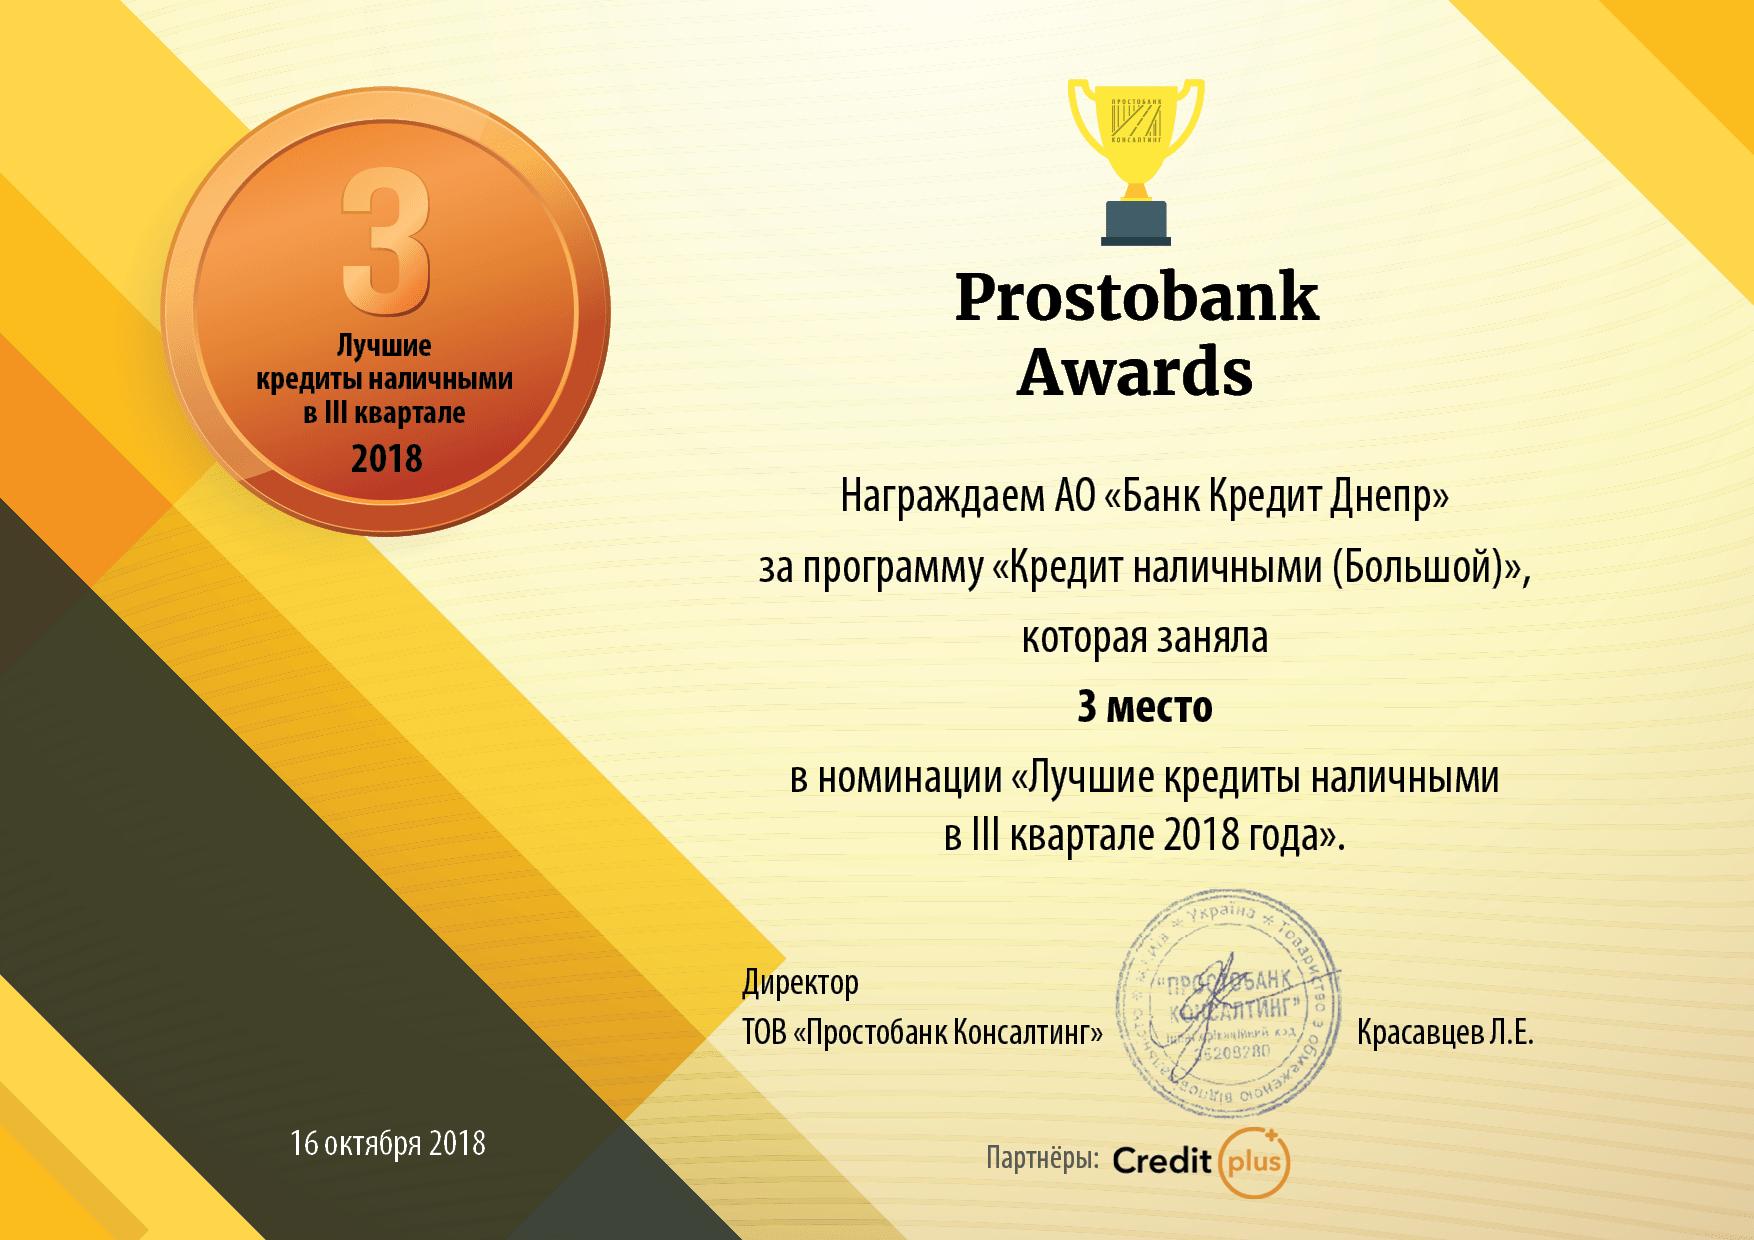 банк украина кредит наличными кредит на банковскую карту сбербанка